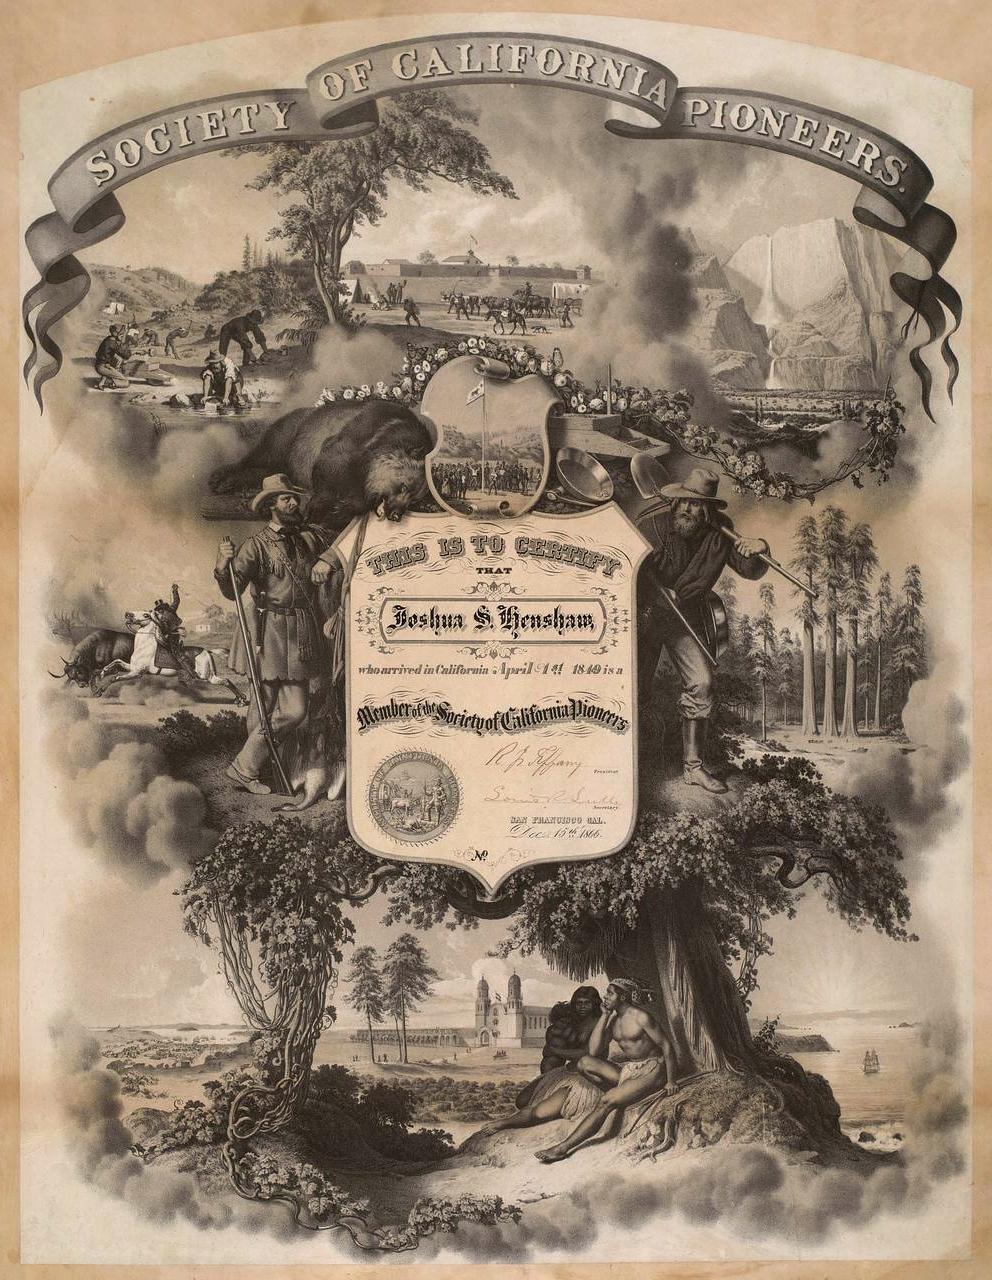 Society of California Pioneers - Wikipedia